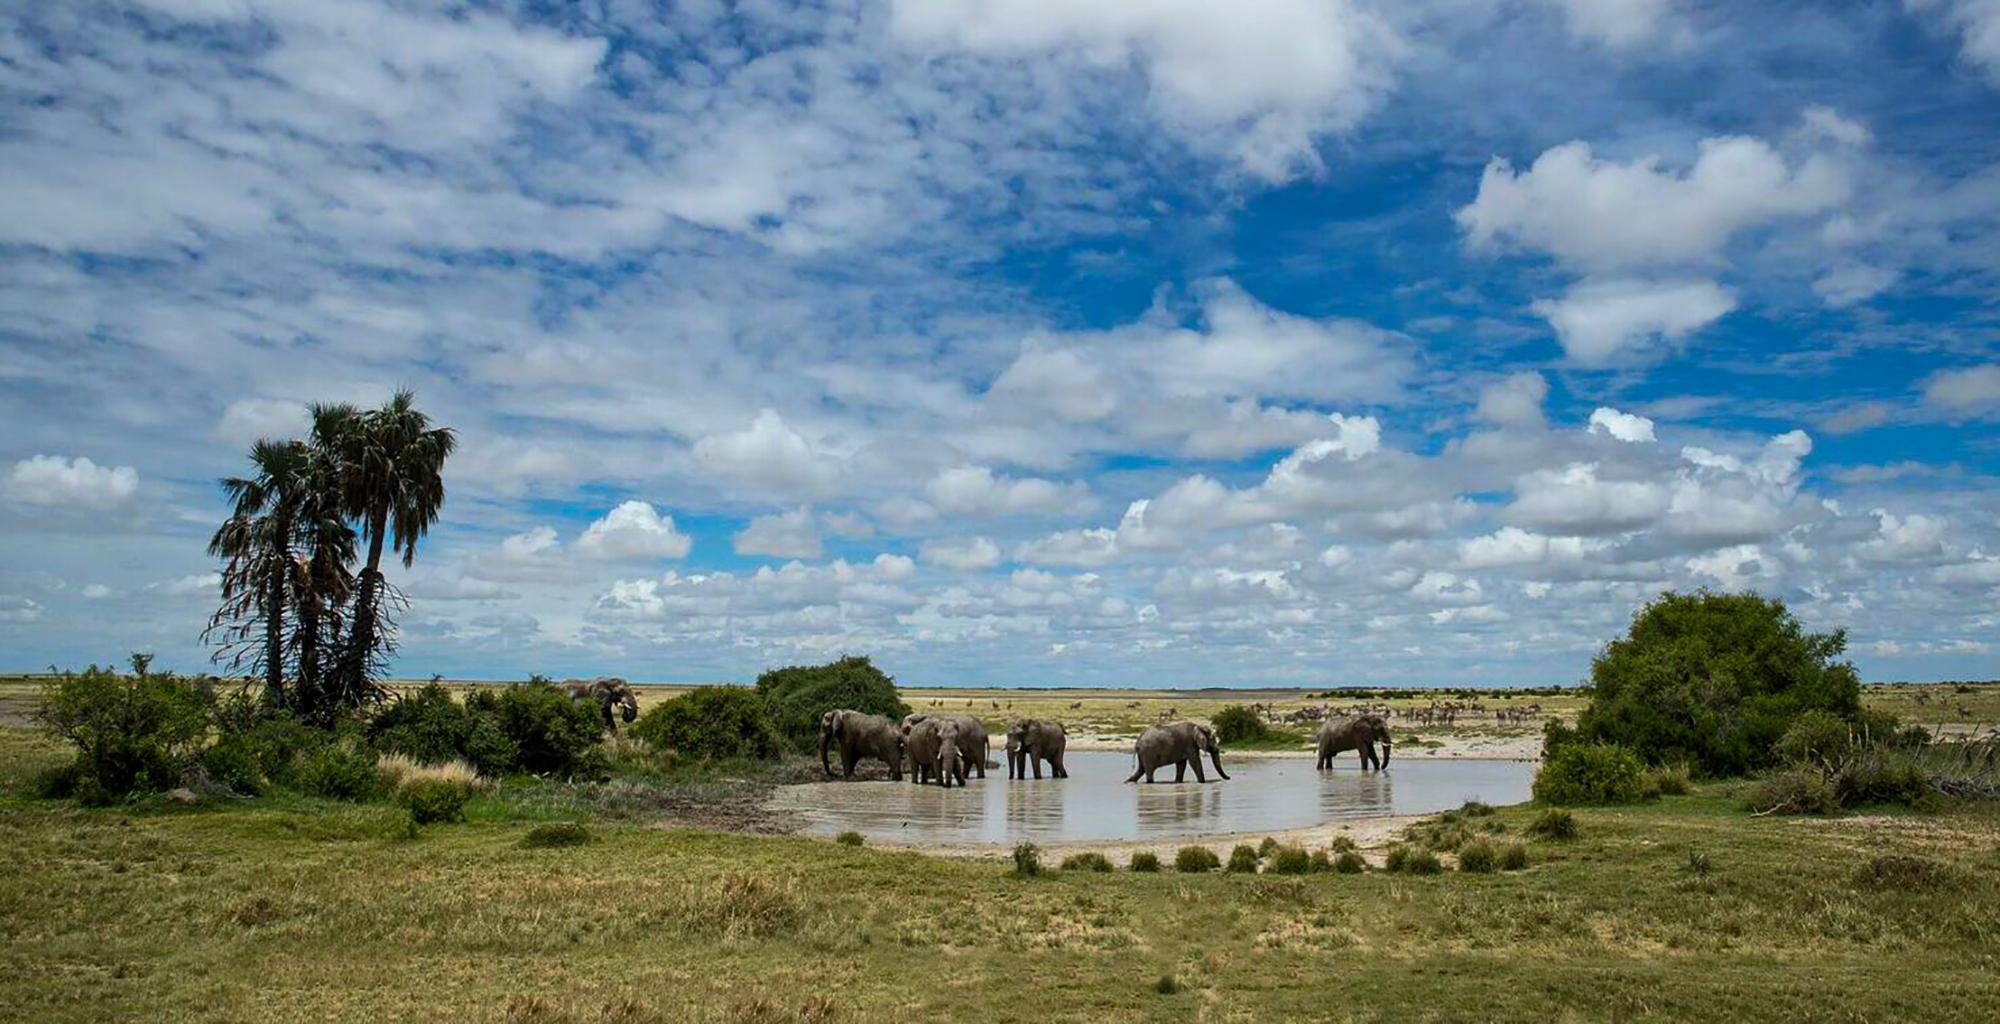 Botswana-Kalahari-Makgadikgadi-Pans-Wildlife-Elephant